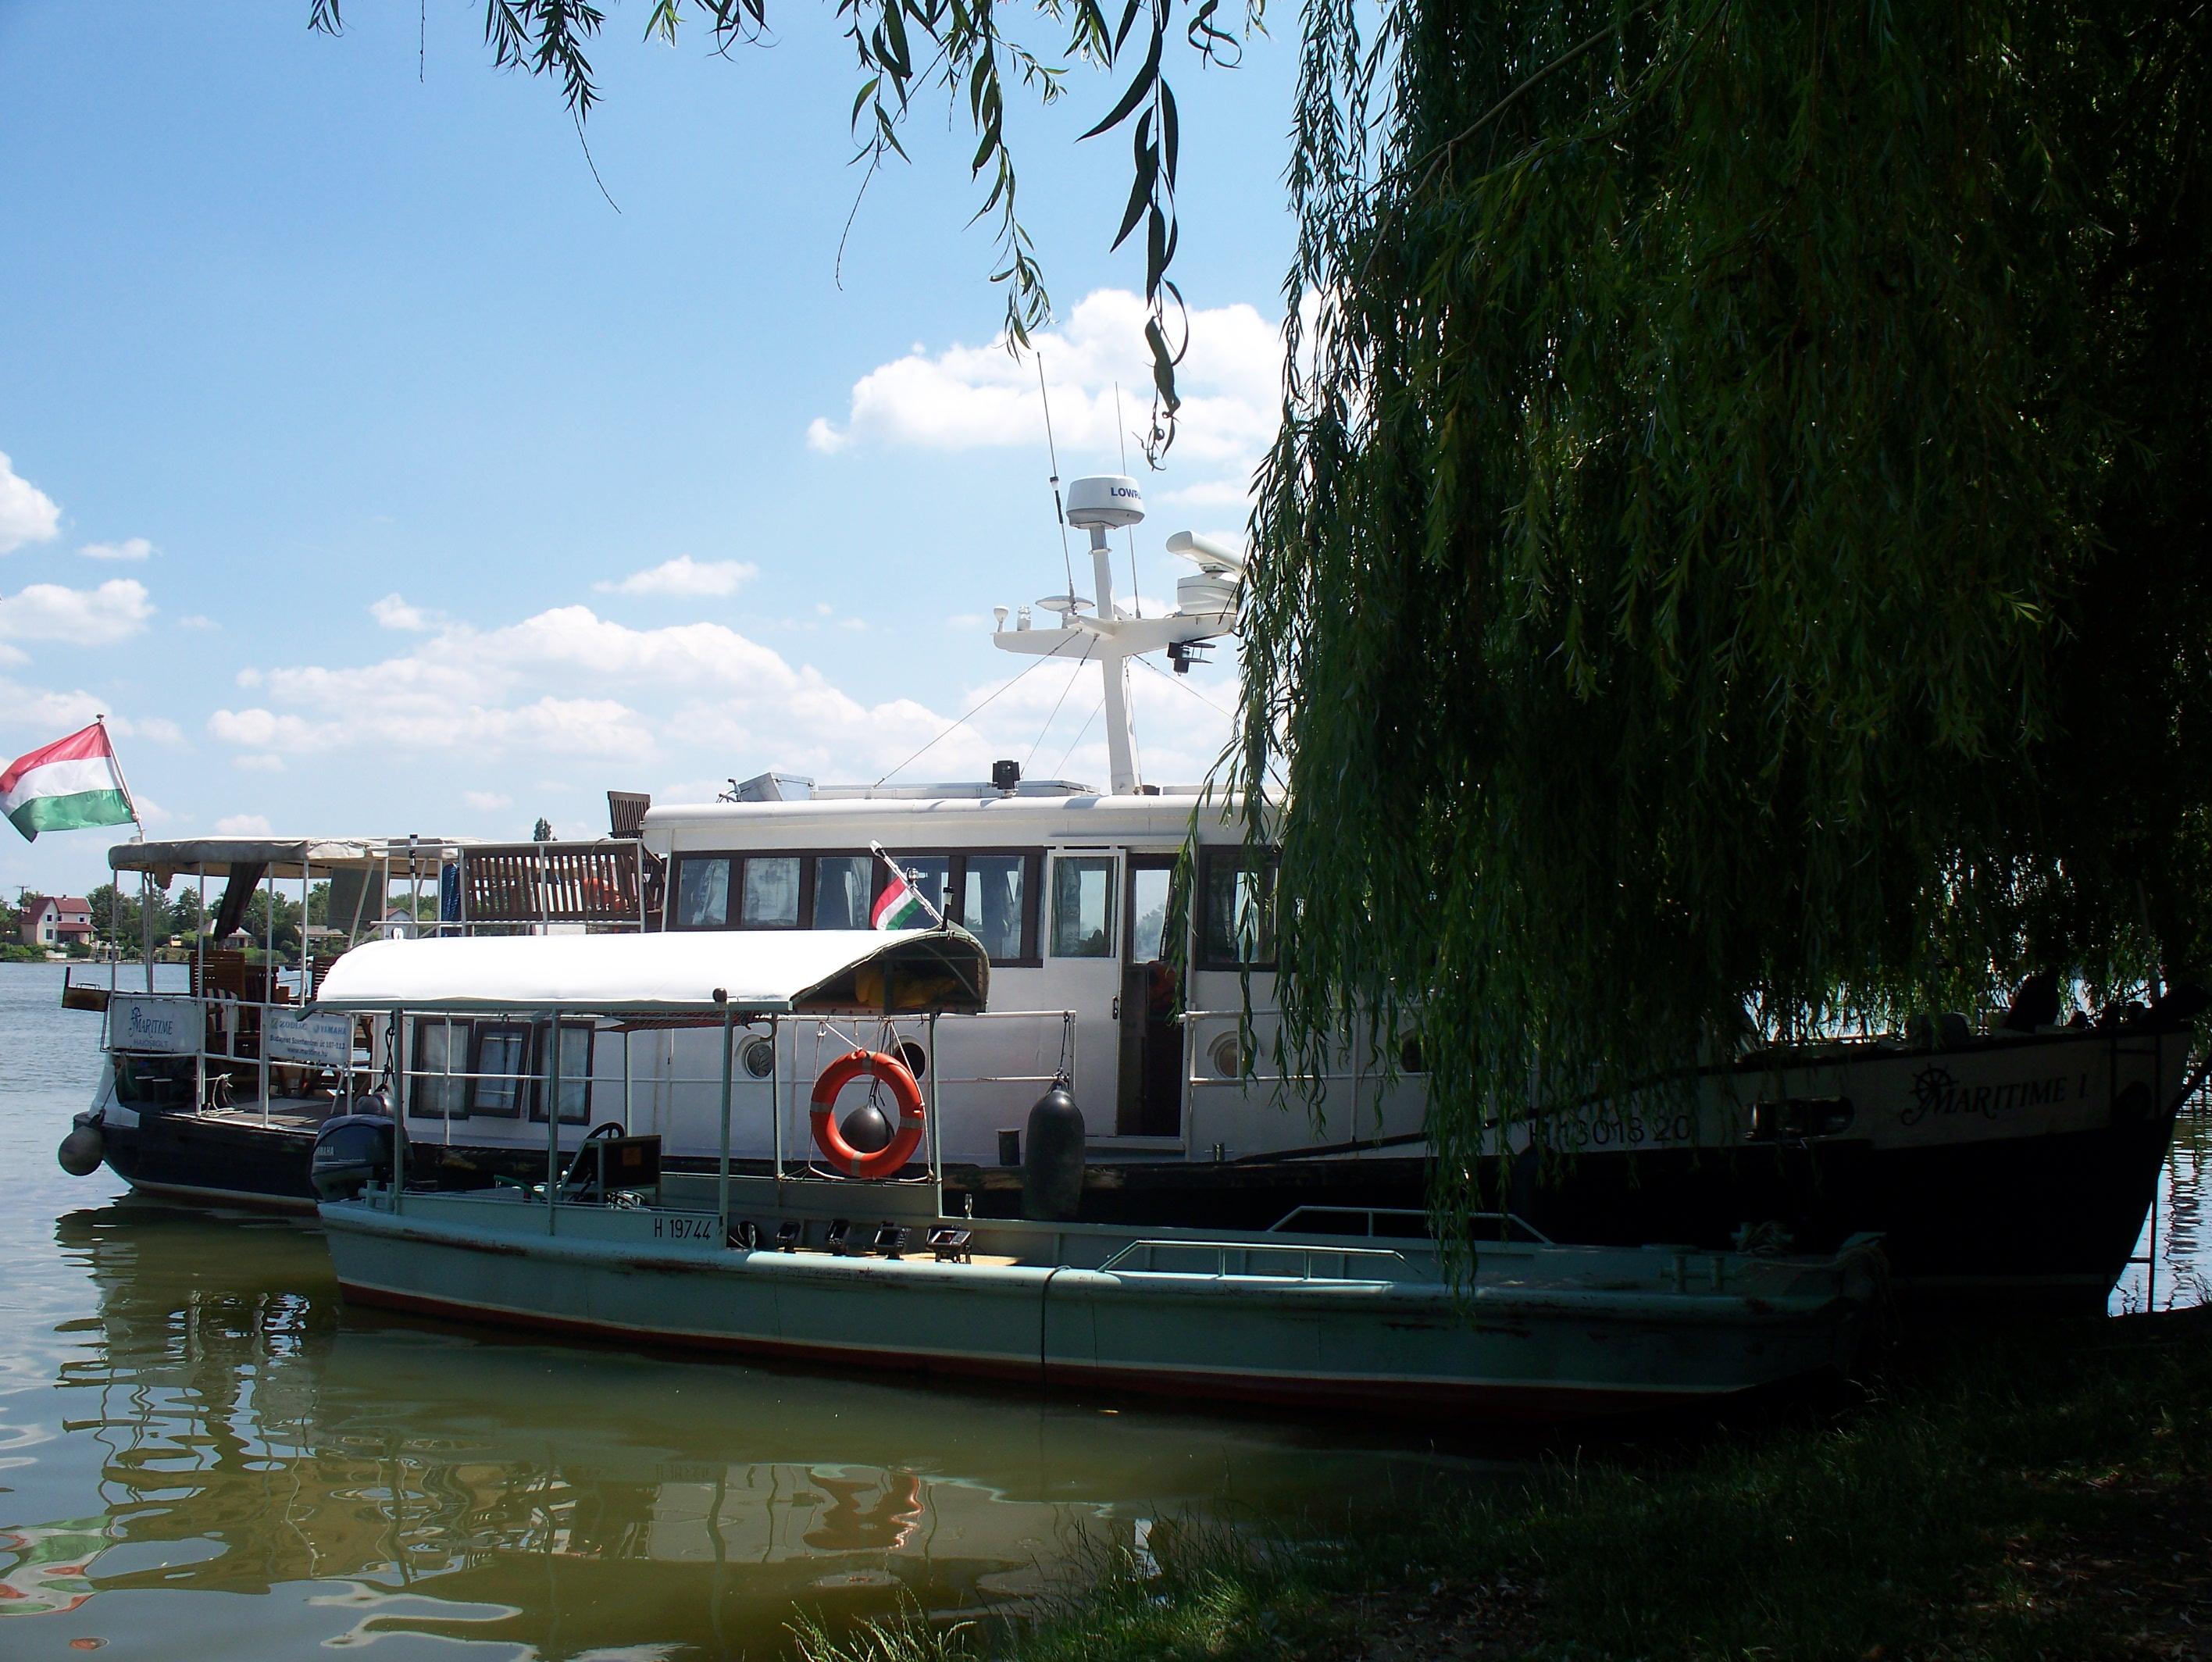 http://www.kisdunainagyhajok.hu/egyebhajok/2012_06_24_maritime_motoros_vonatohajo_a_rackevei_piacnal/2012_06_24_maritime_motoros_vonatohajo_a_rackevei_piacnal_007.jpg